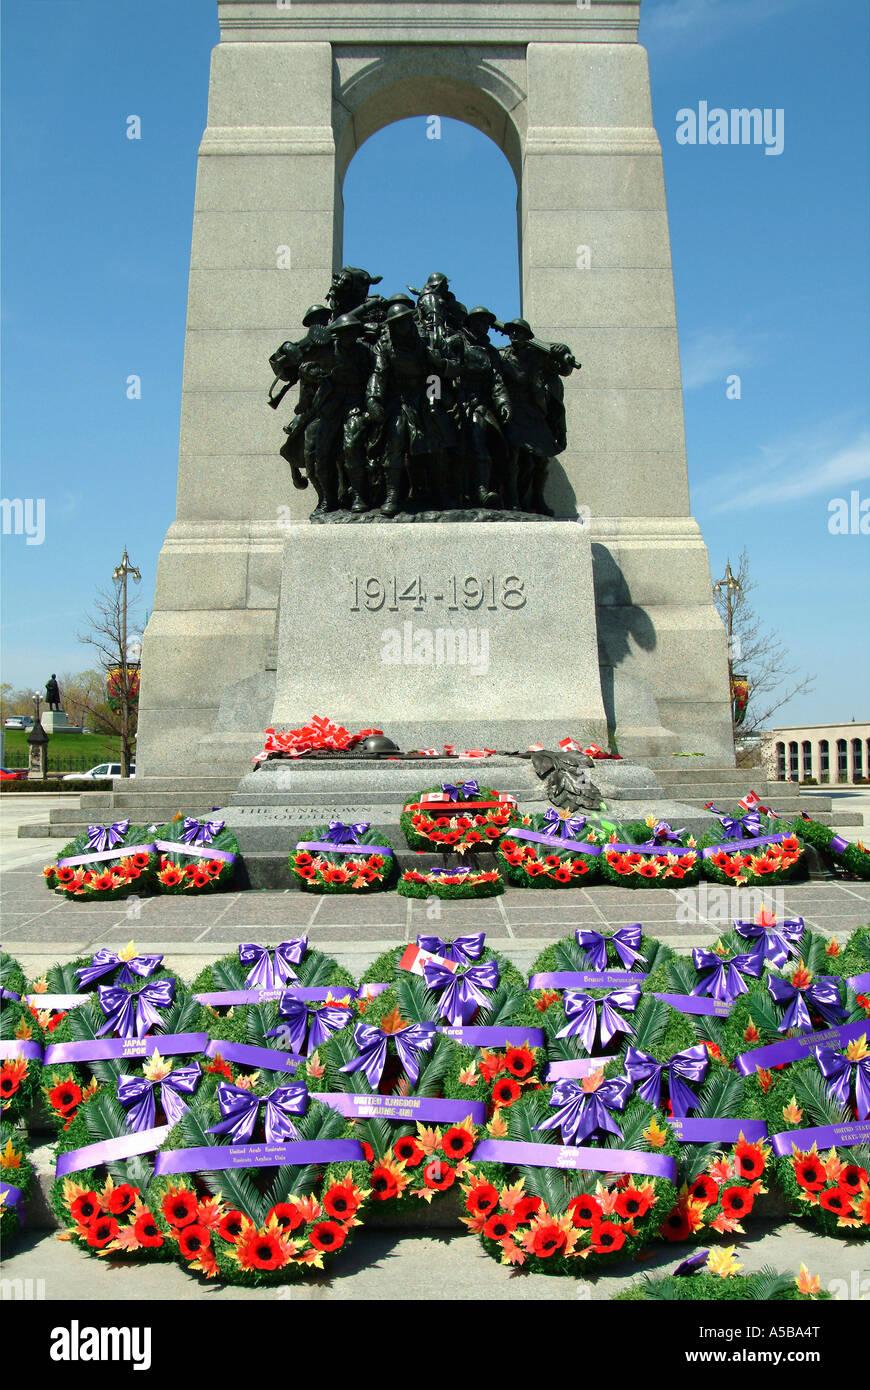 Ottawa's National War Memorial. - Stock Image